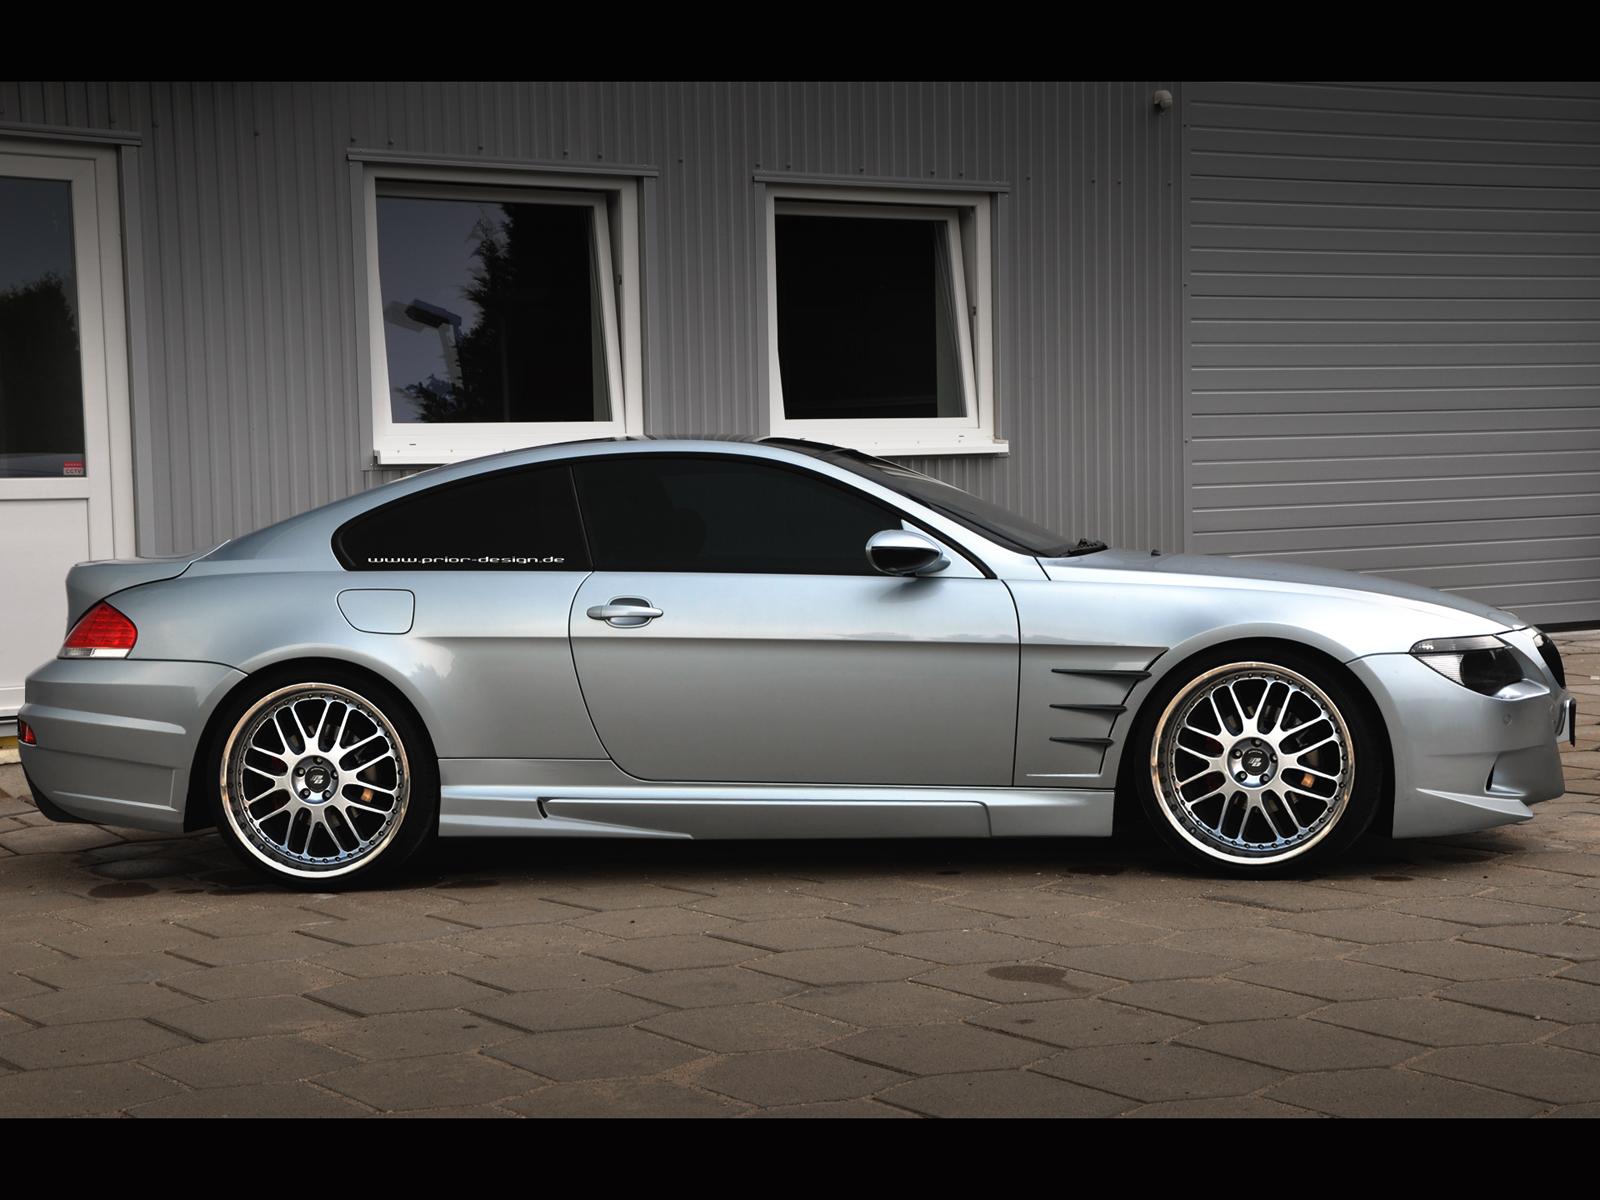 BMW 6 SERIES BY PRIOR DESIGN